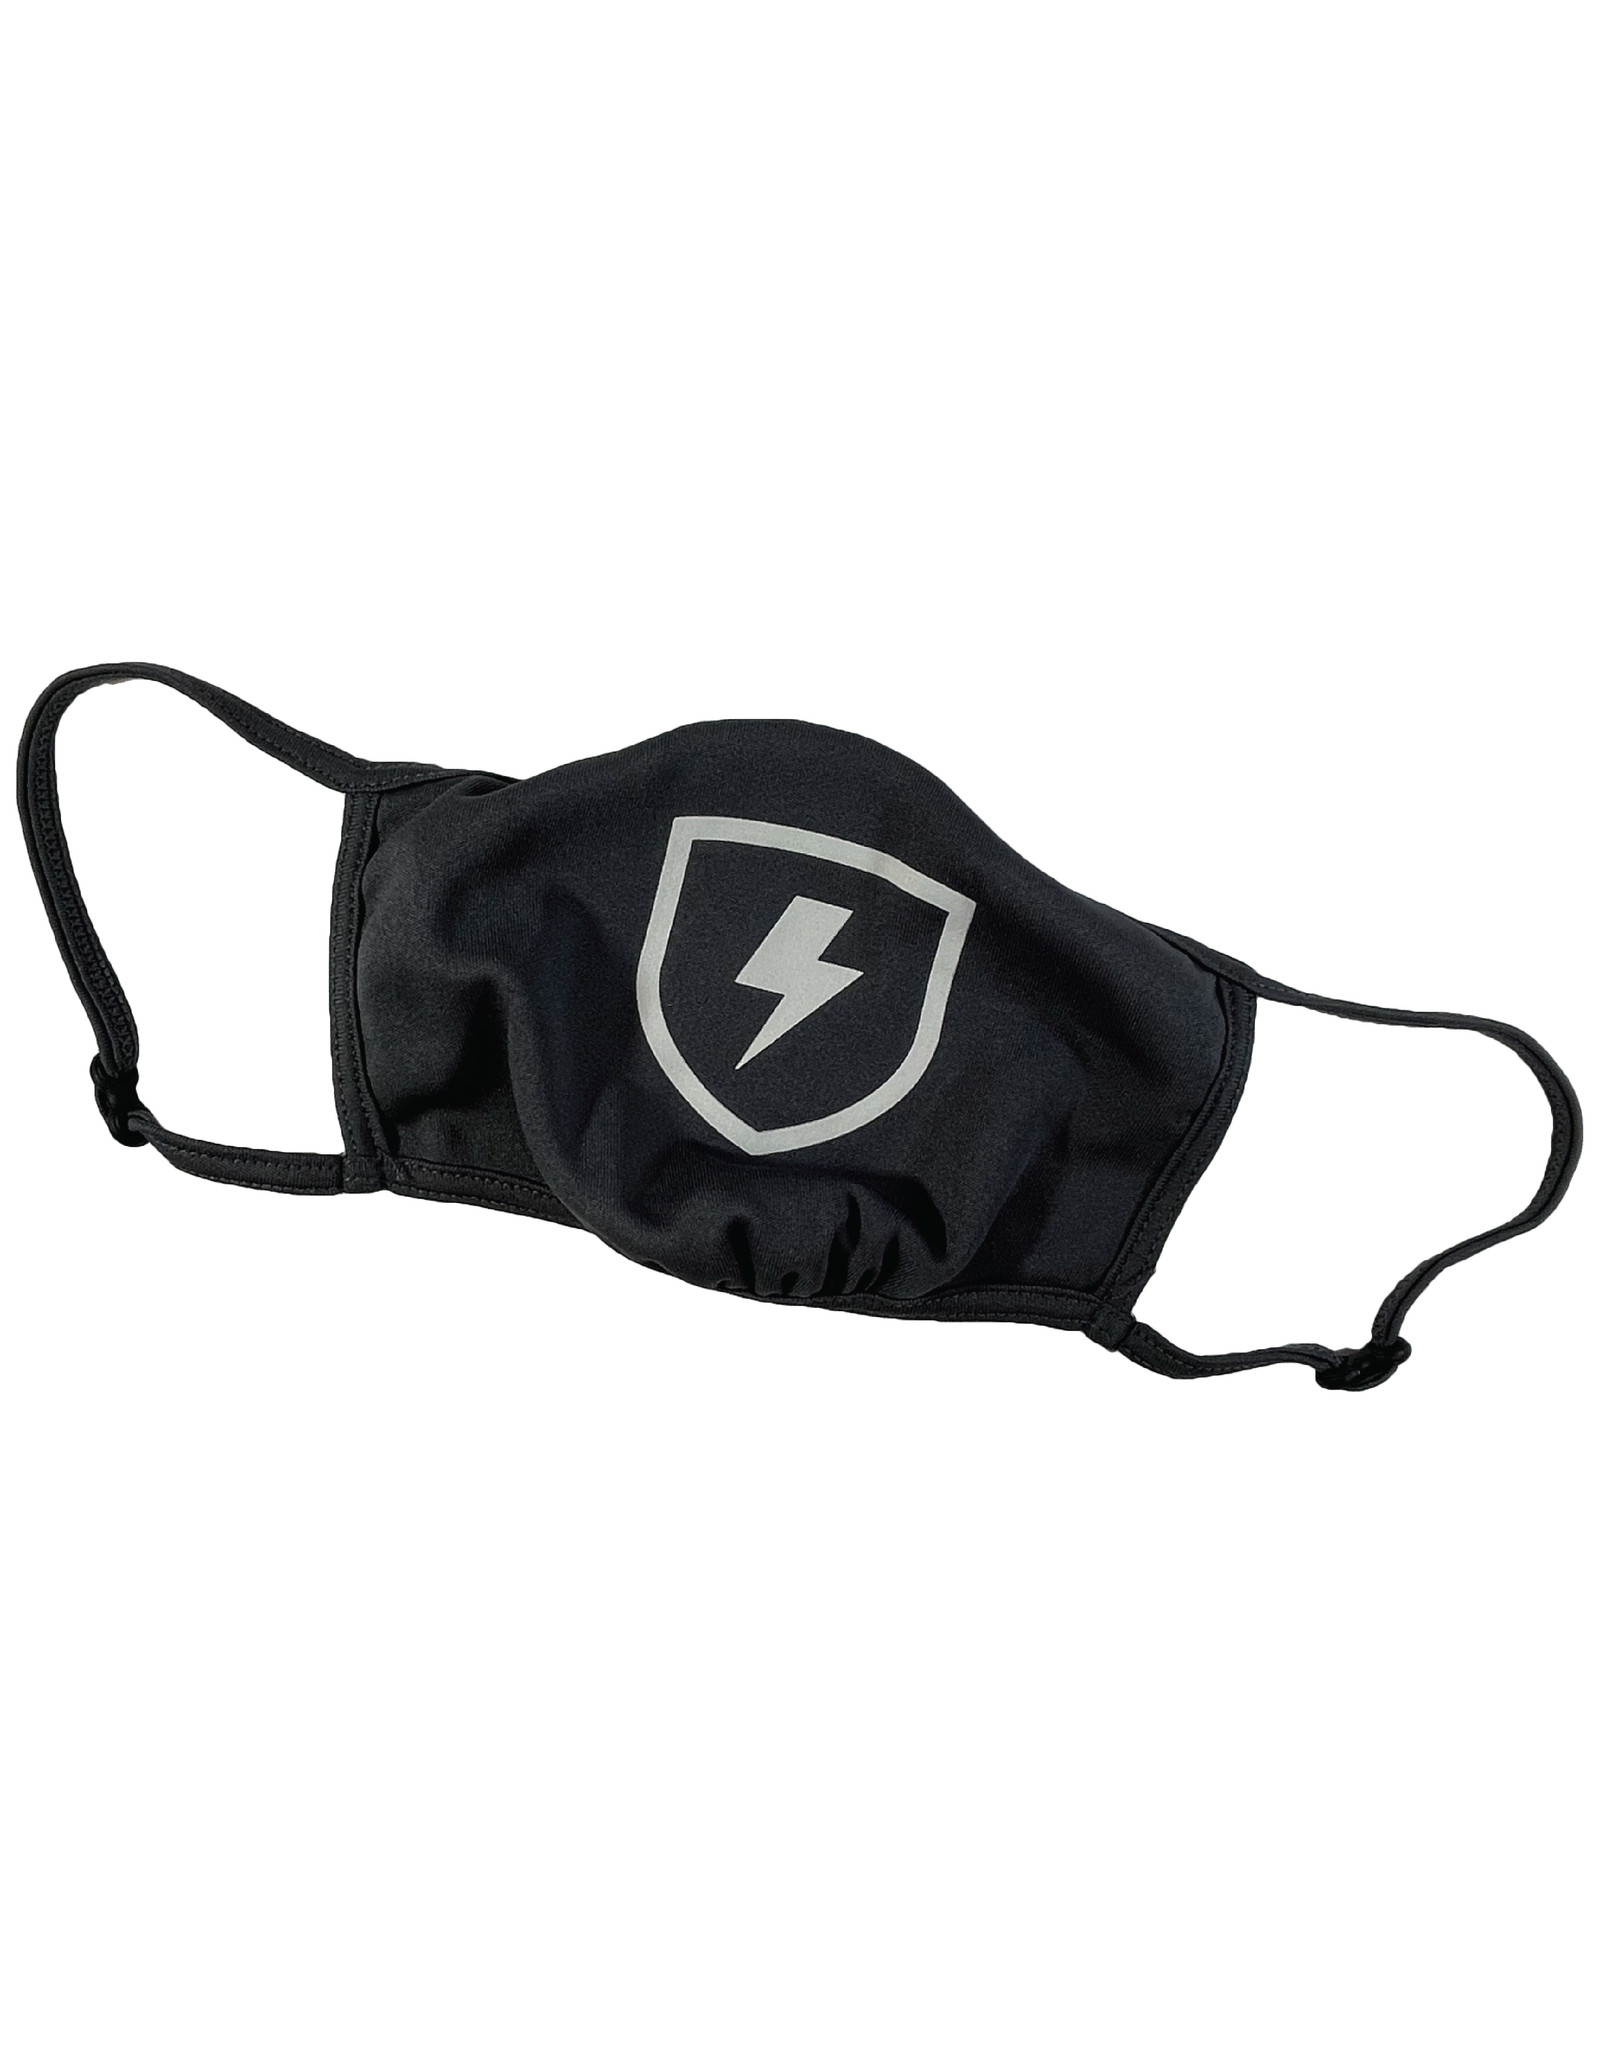 Defender Outdoors Face Mask